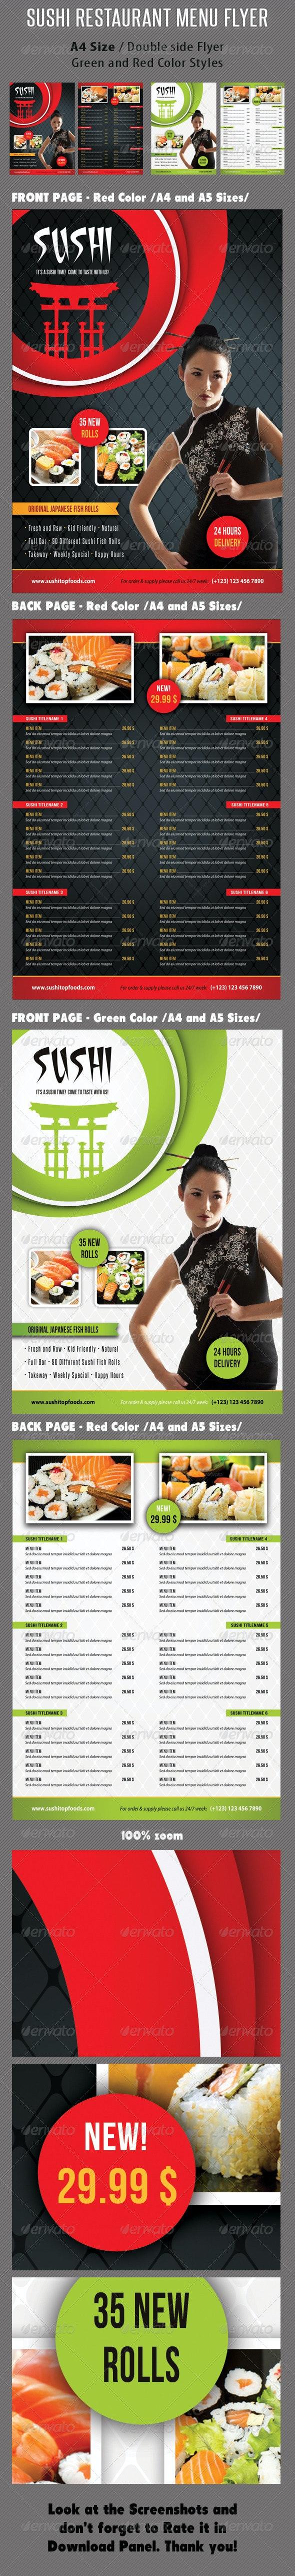 Sushi Restaurant Menu Flyer V04 - Food Menus Print Templates